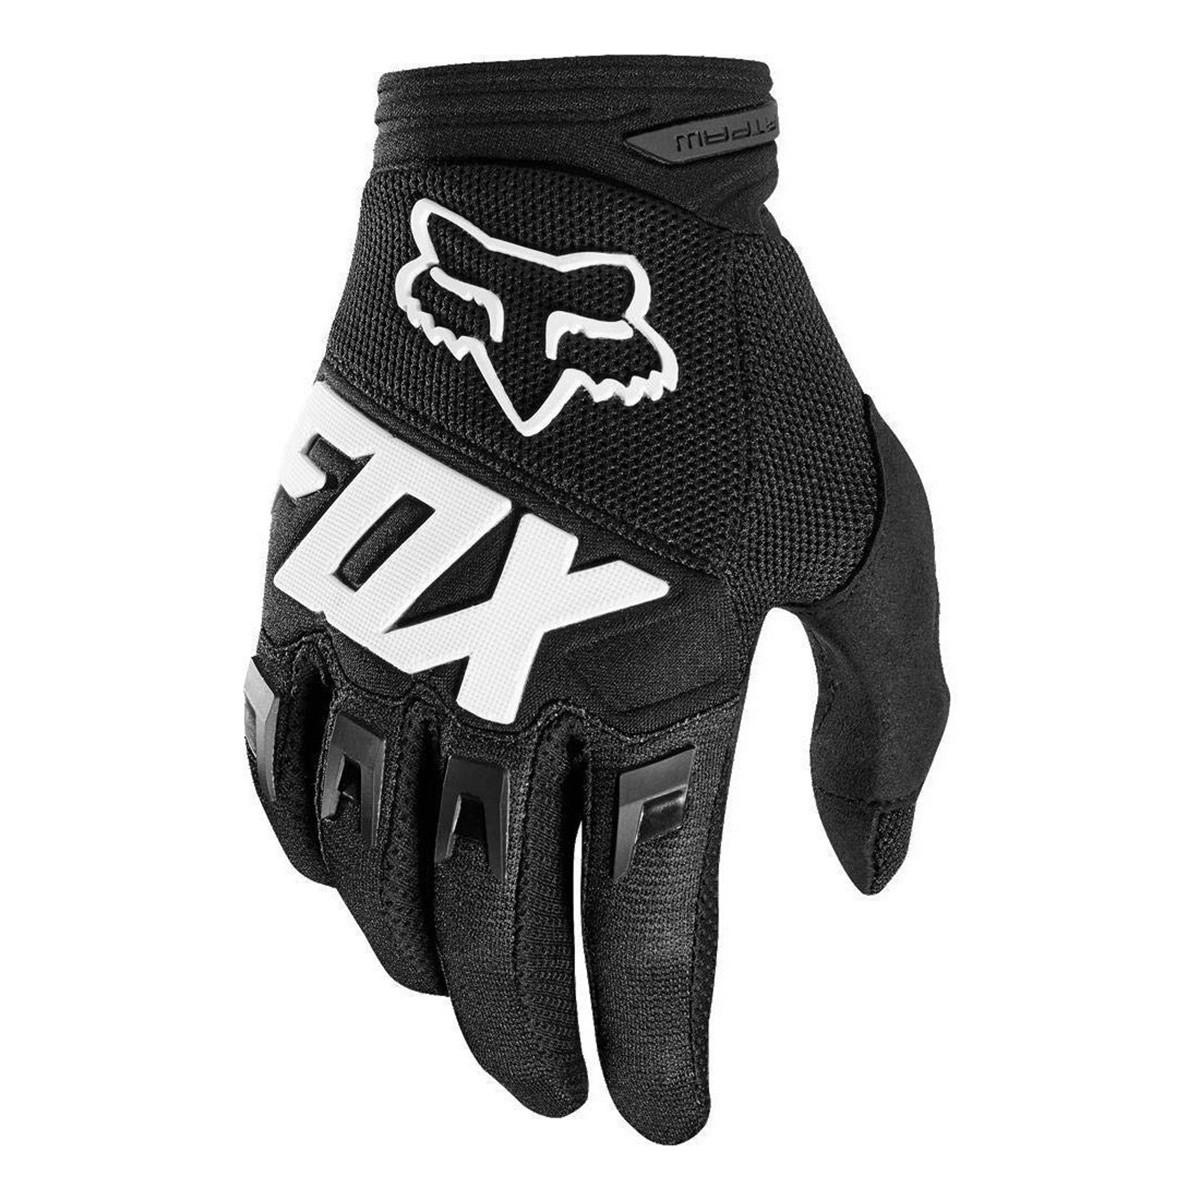 Guantes de Motocross Fox Dirtpaw Antideslizante Negro